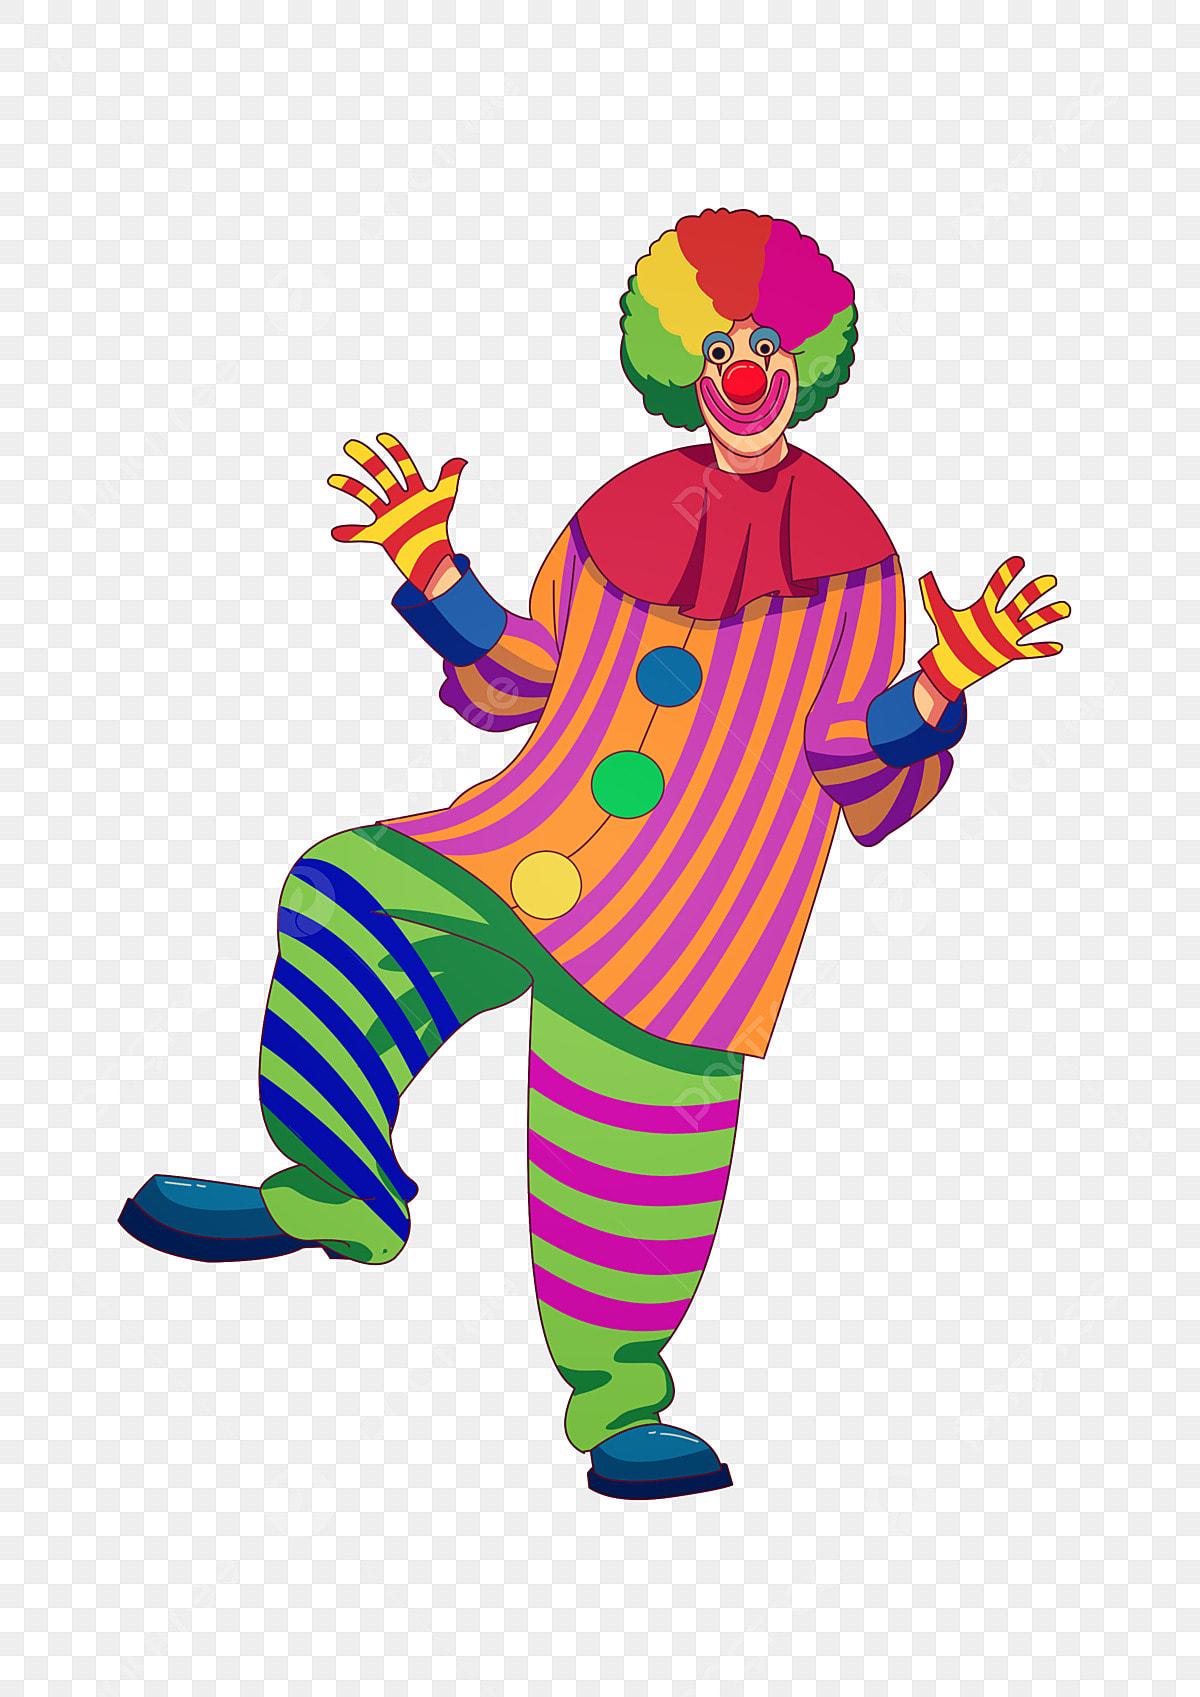 April happy. Circus clown fools day